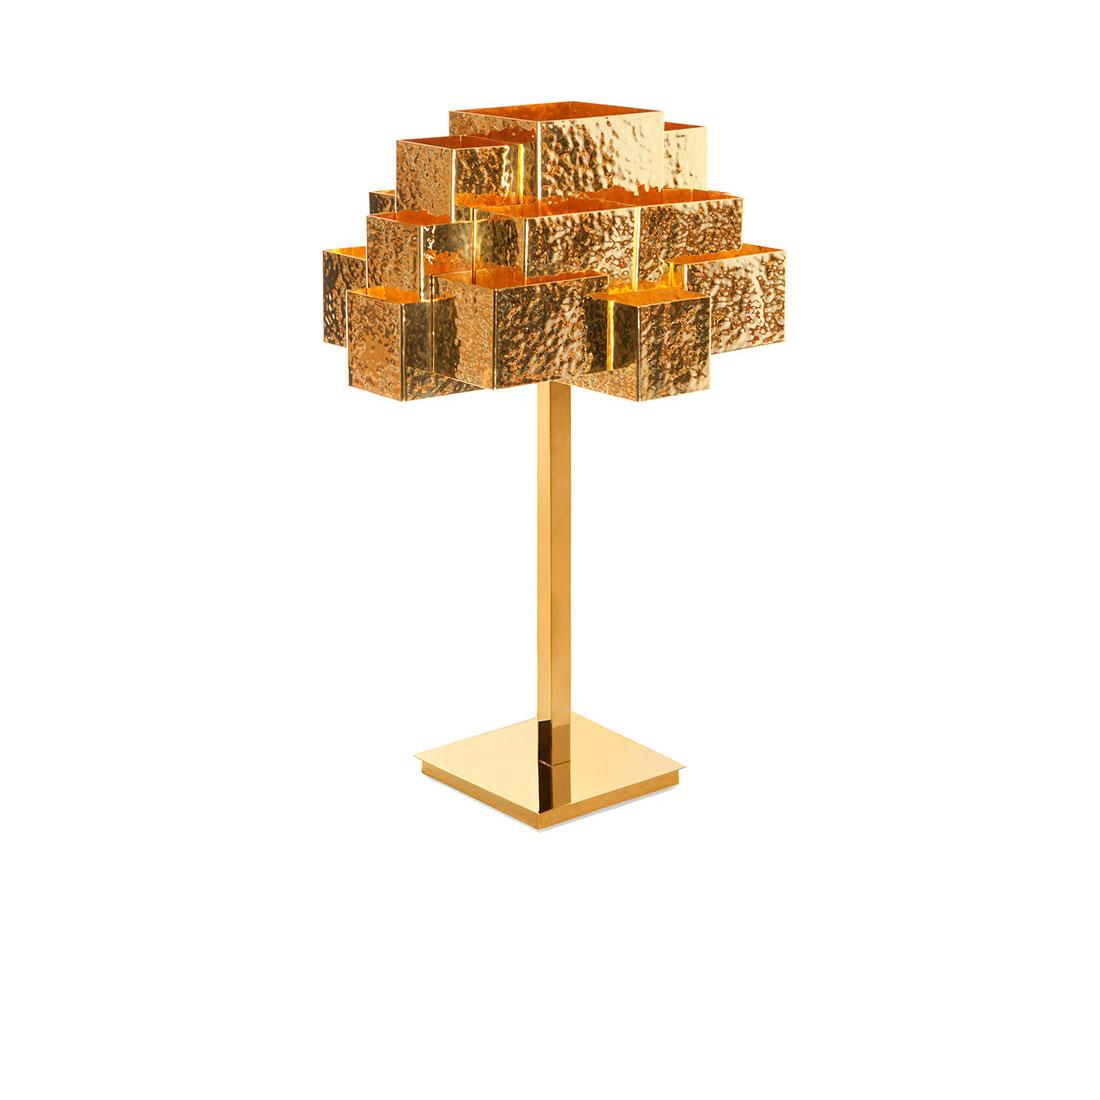 Inspiring-trees-table-lamp